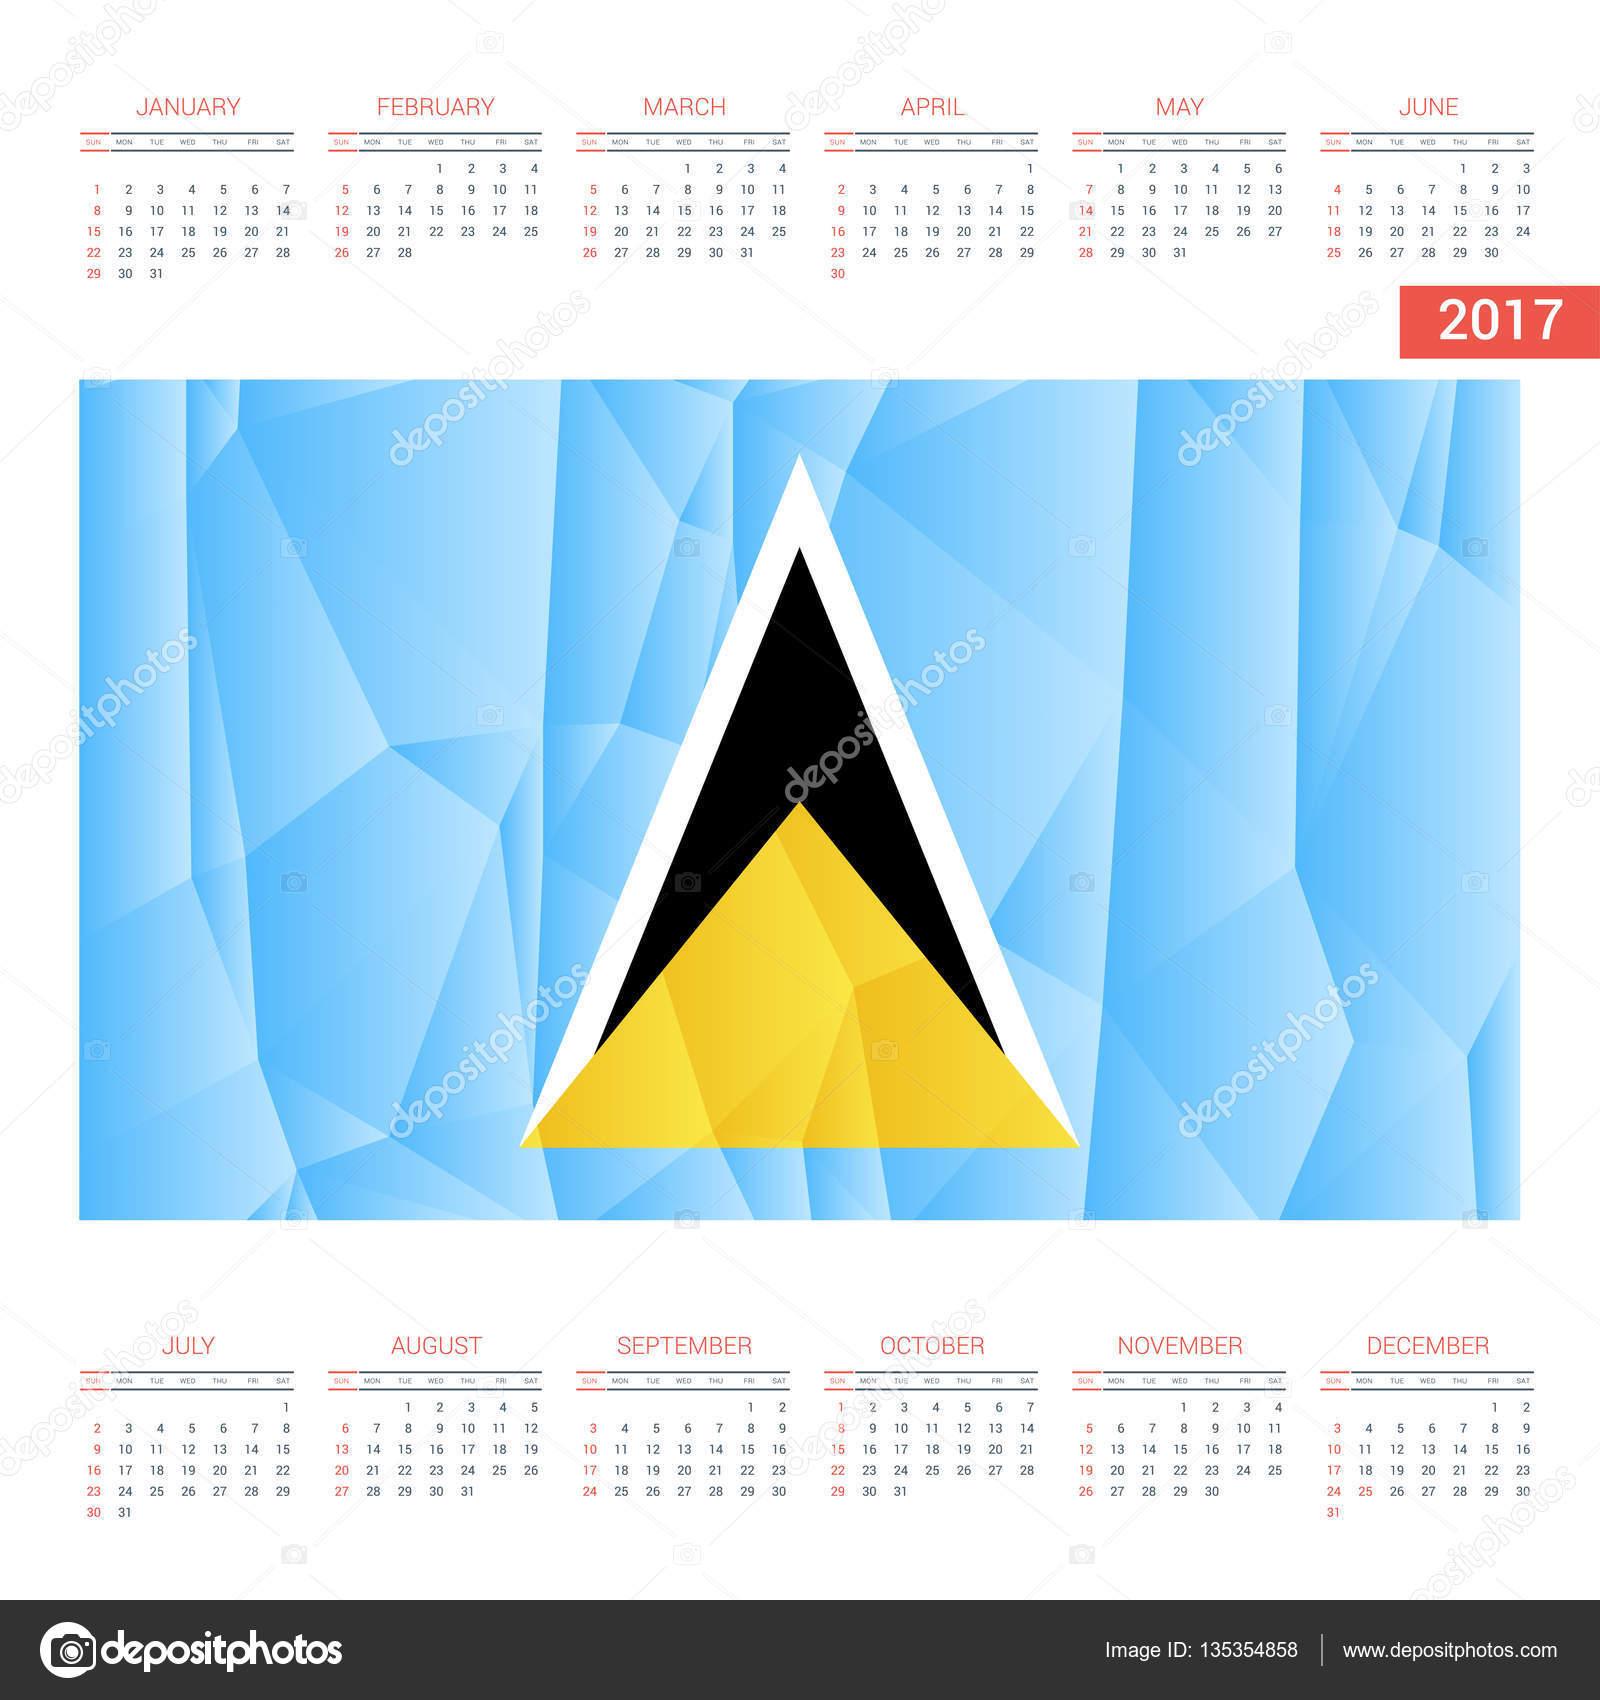 Santa Lucia Calendario.Calendario 2017 Con La Bandera De Santa Lucia Vector De